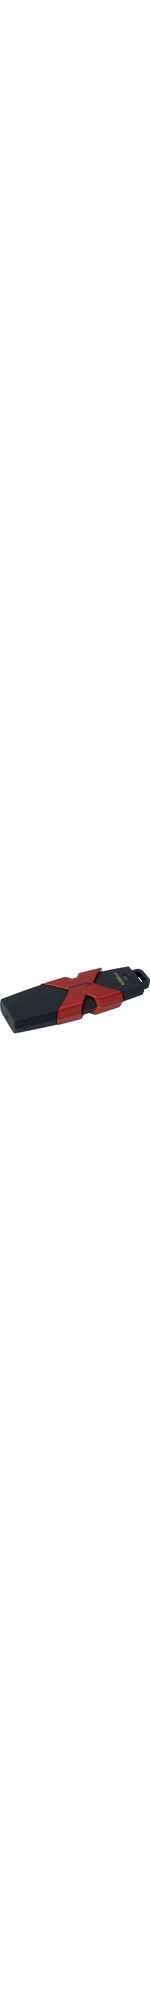 Kingston HyperX Savage 128 GB USB 3.1 Flash Drive